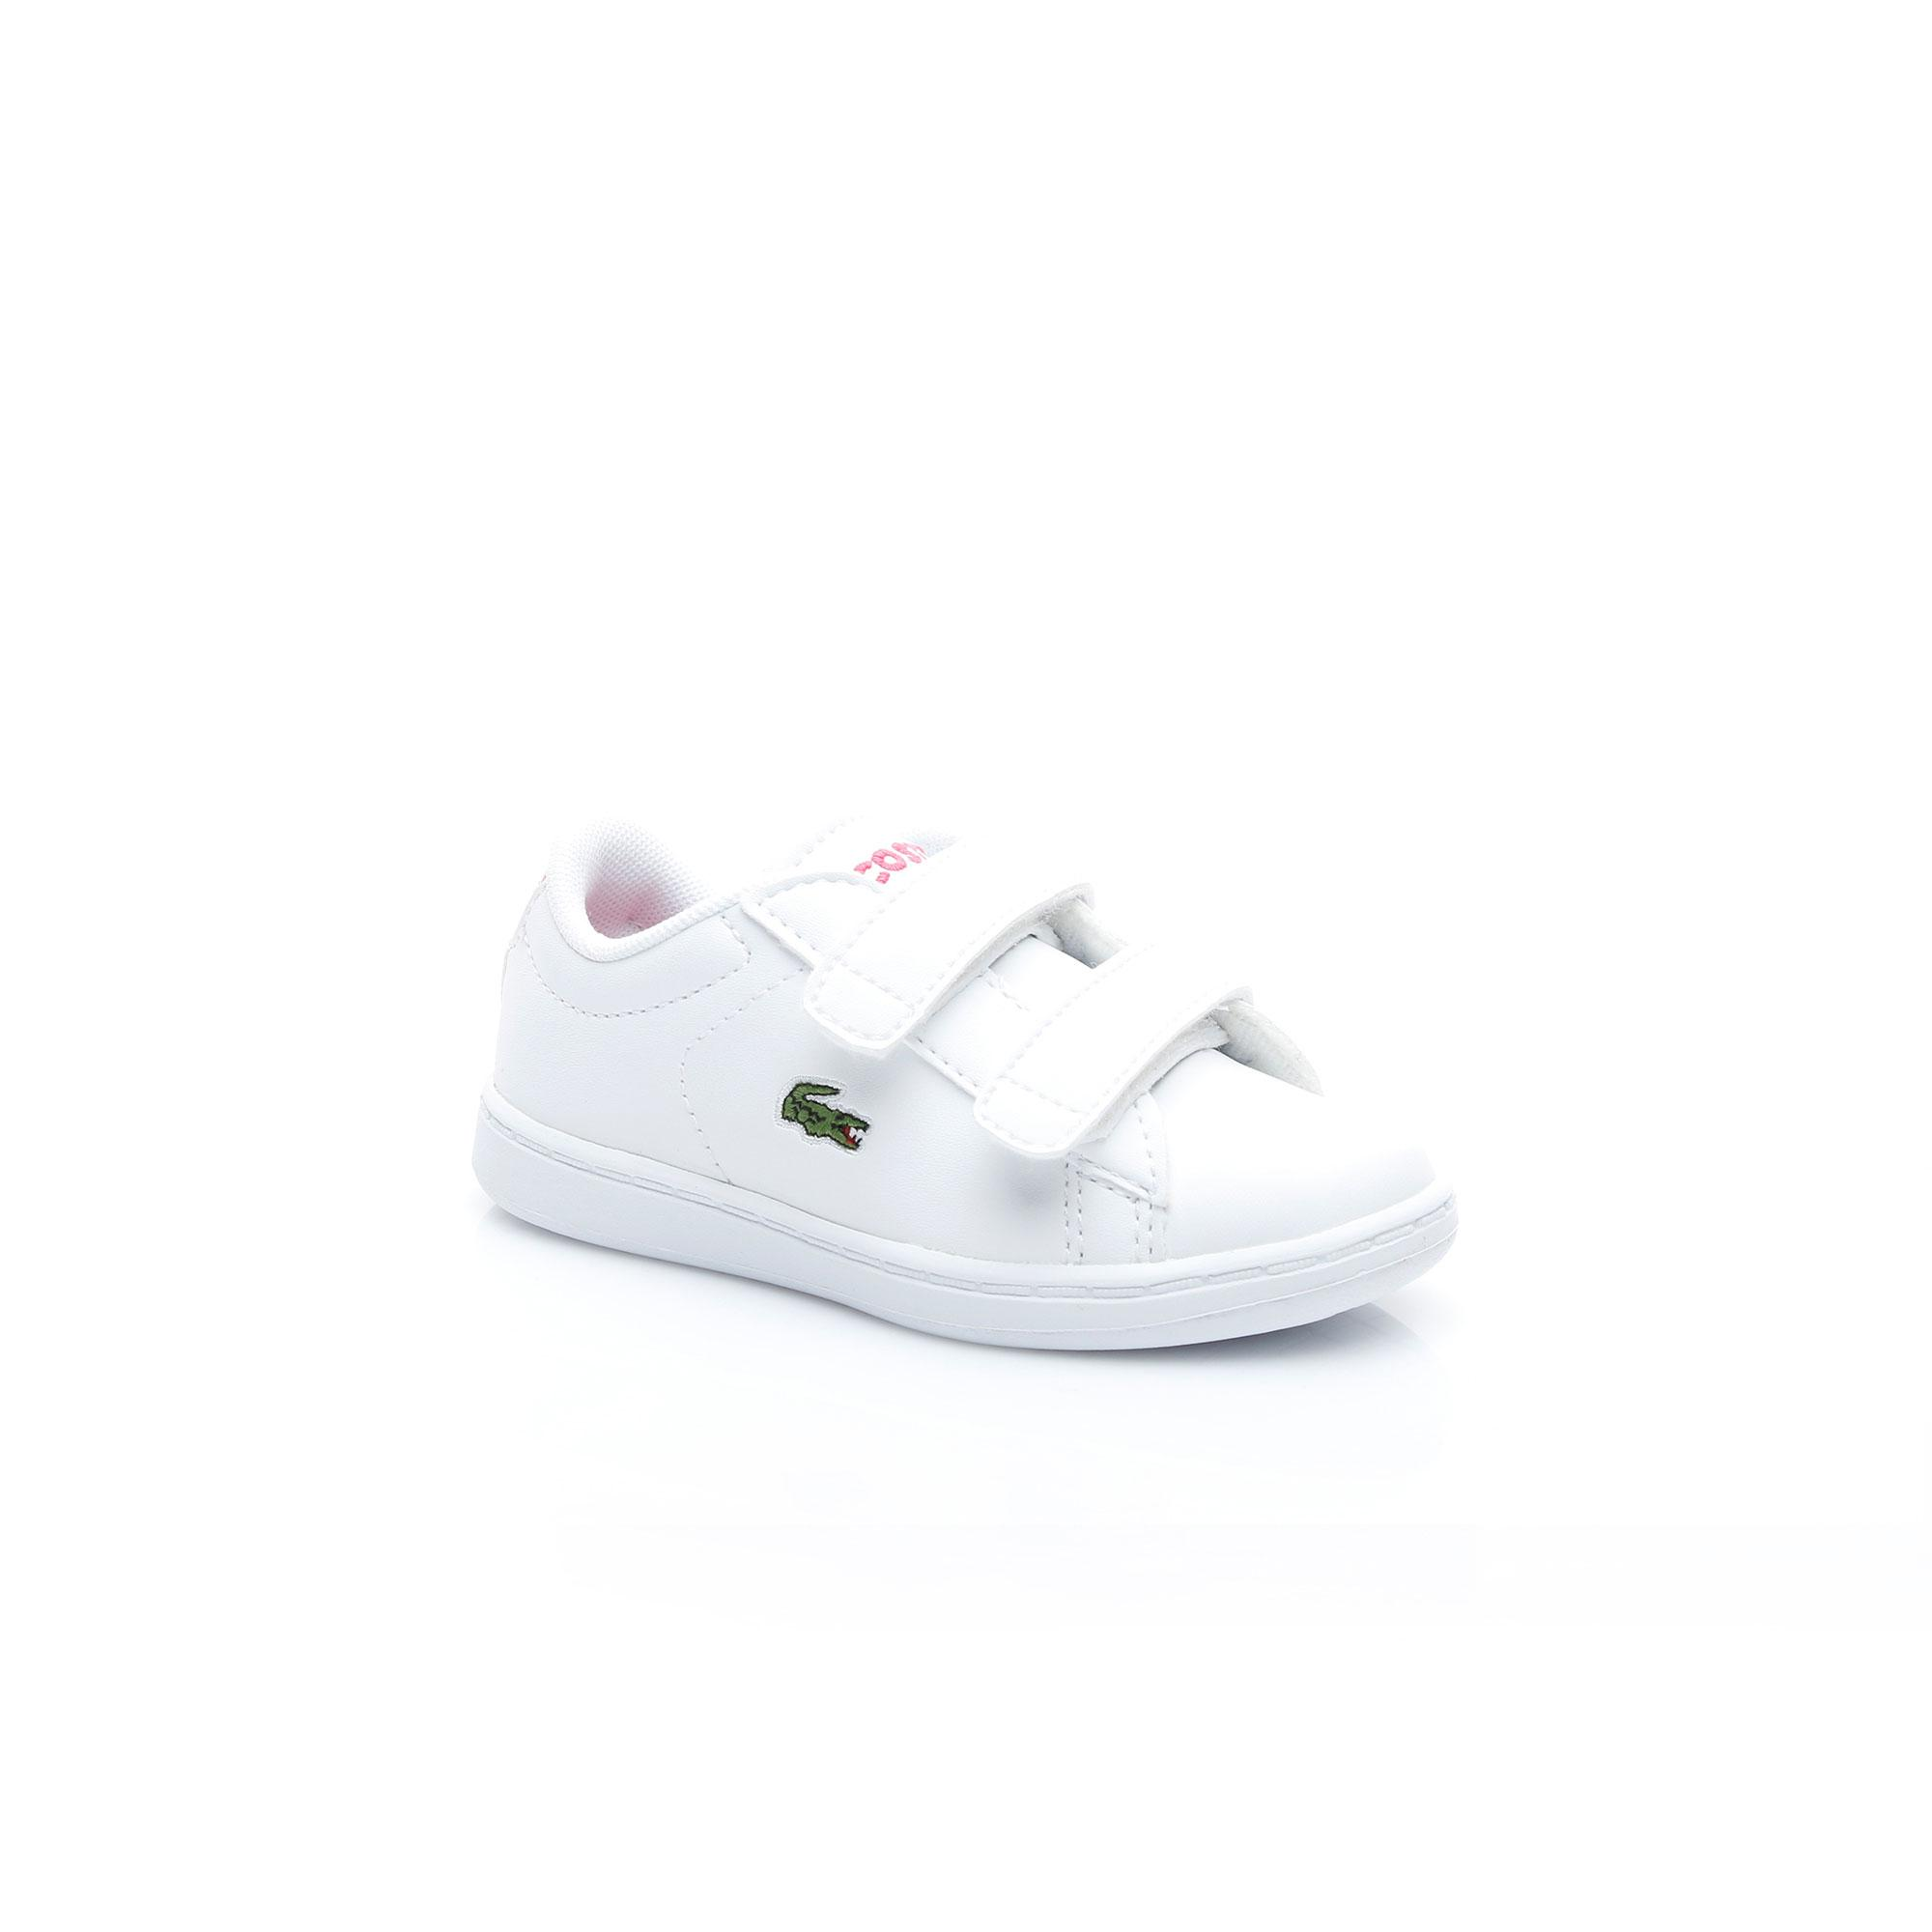 Lacoste Kız Çocuk Carnaby Evo BL 1 Beyaz Sneaker